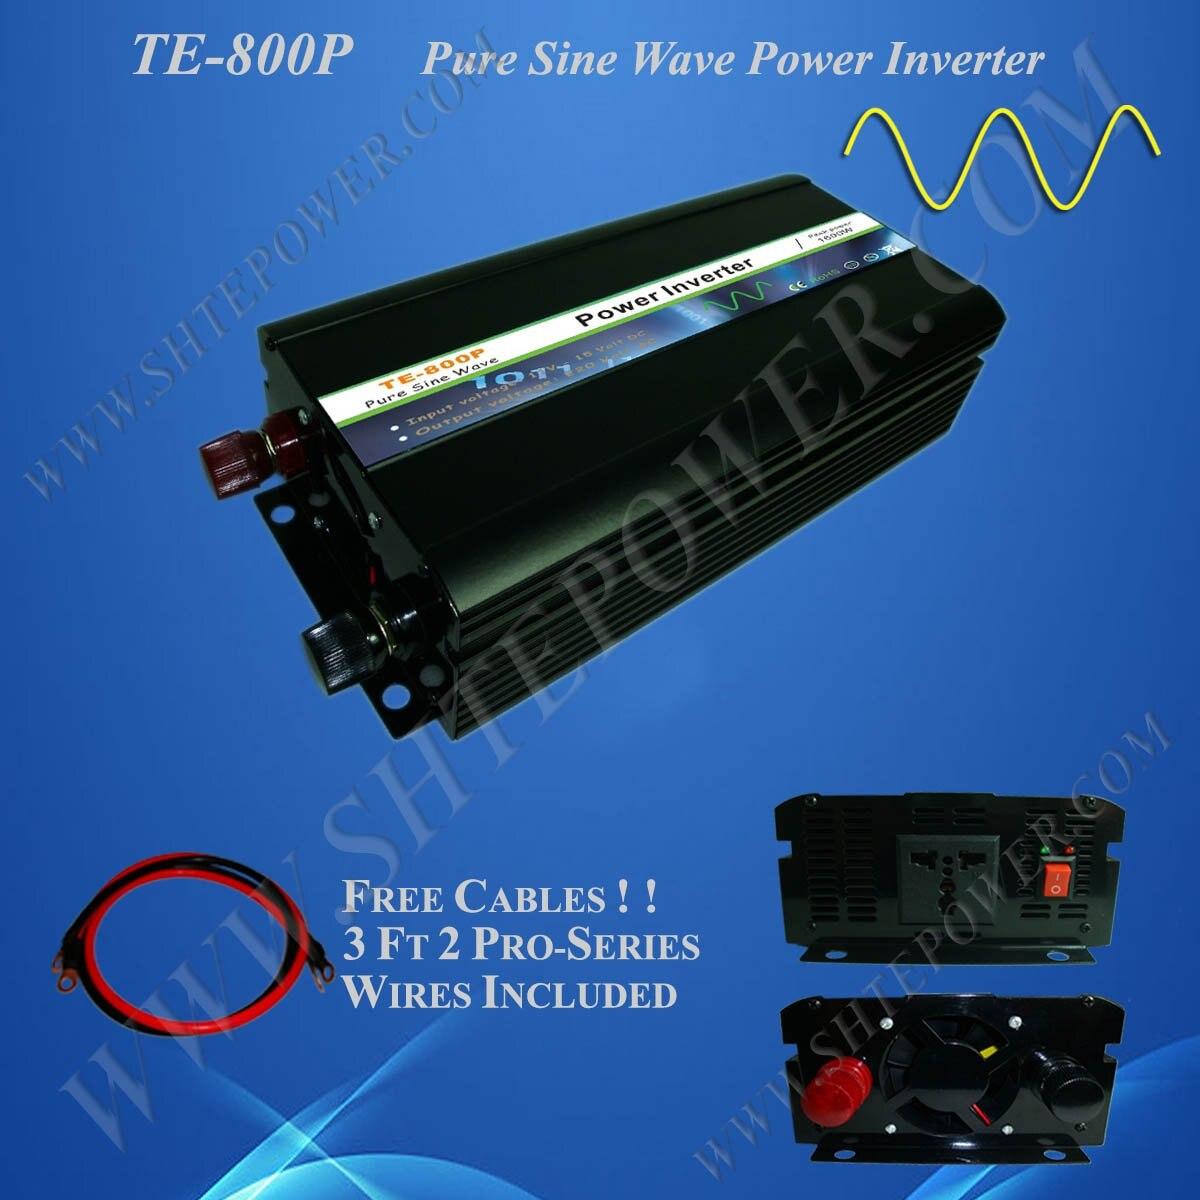 Off Grid Solar Power Inverter, 800w 24vdc to 120vac inverter, True Sine Wave Power Invertor цены